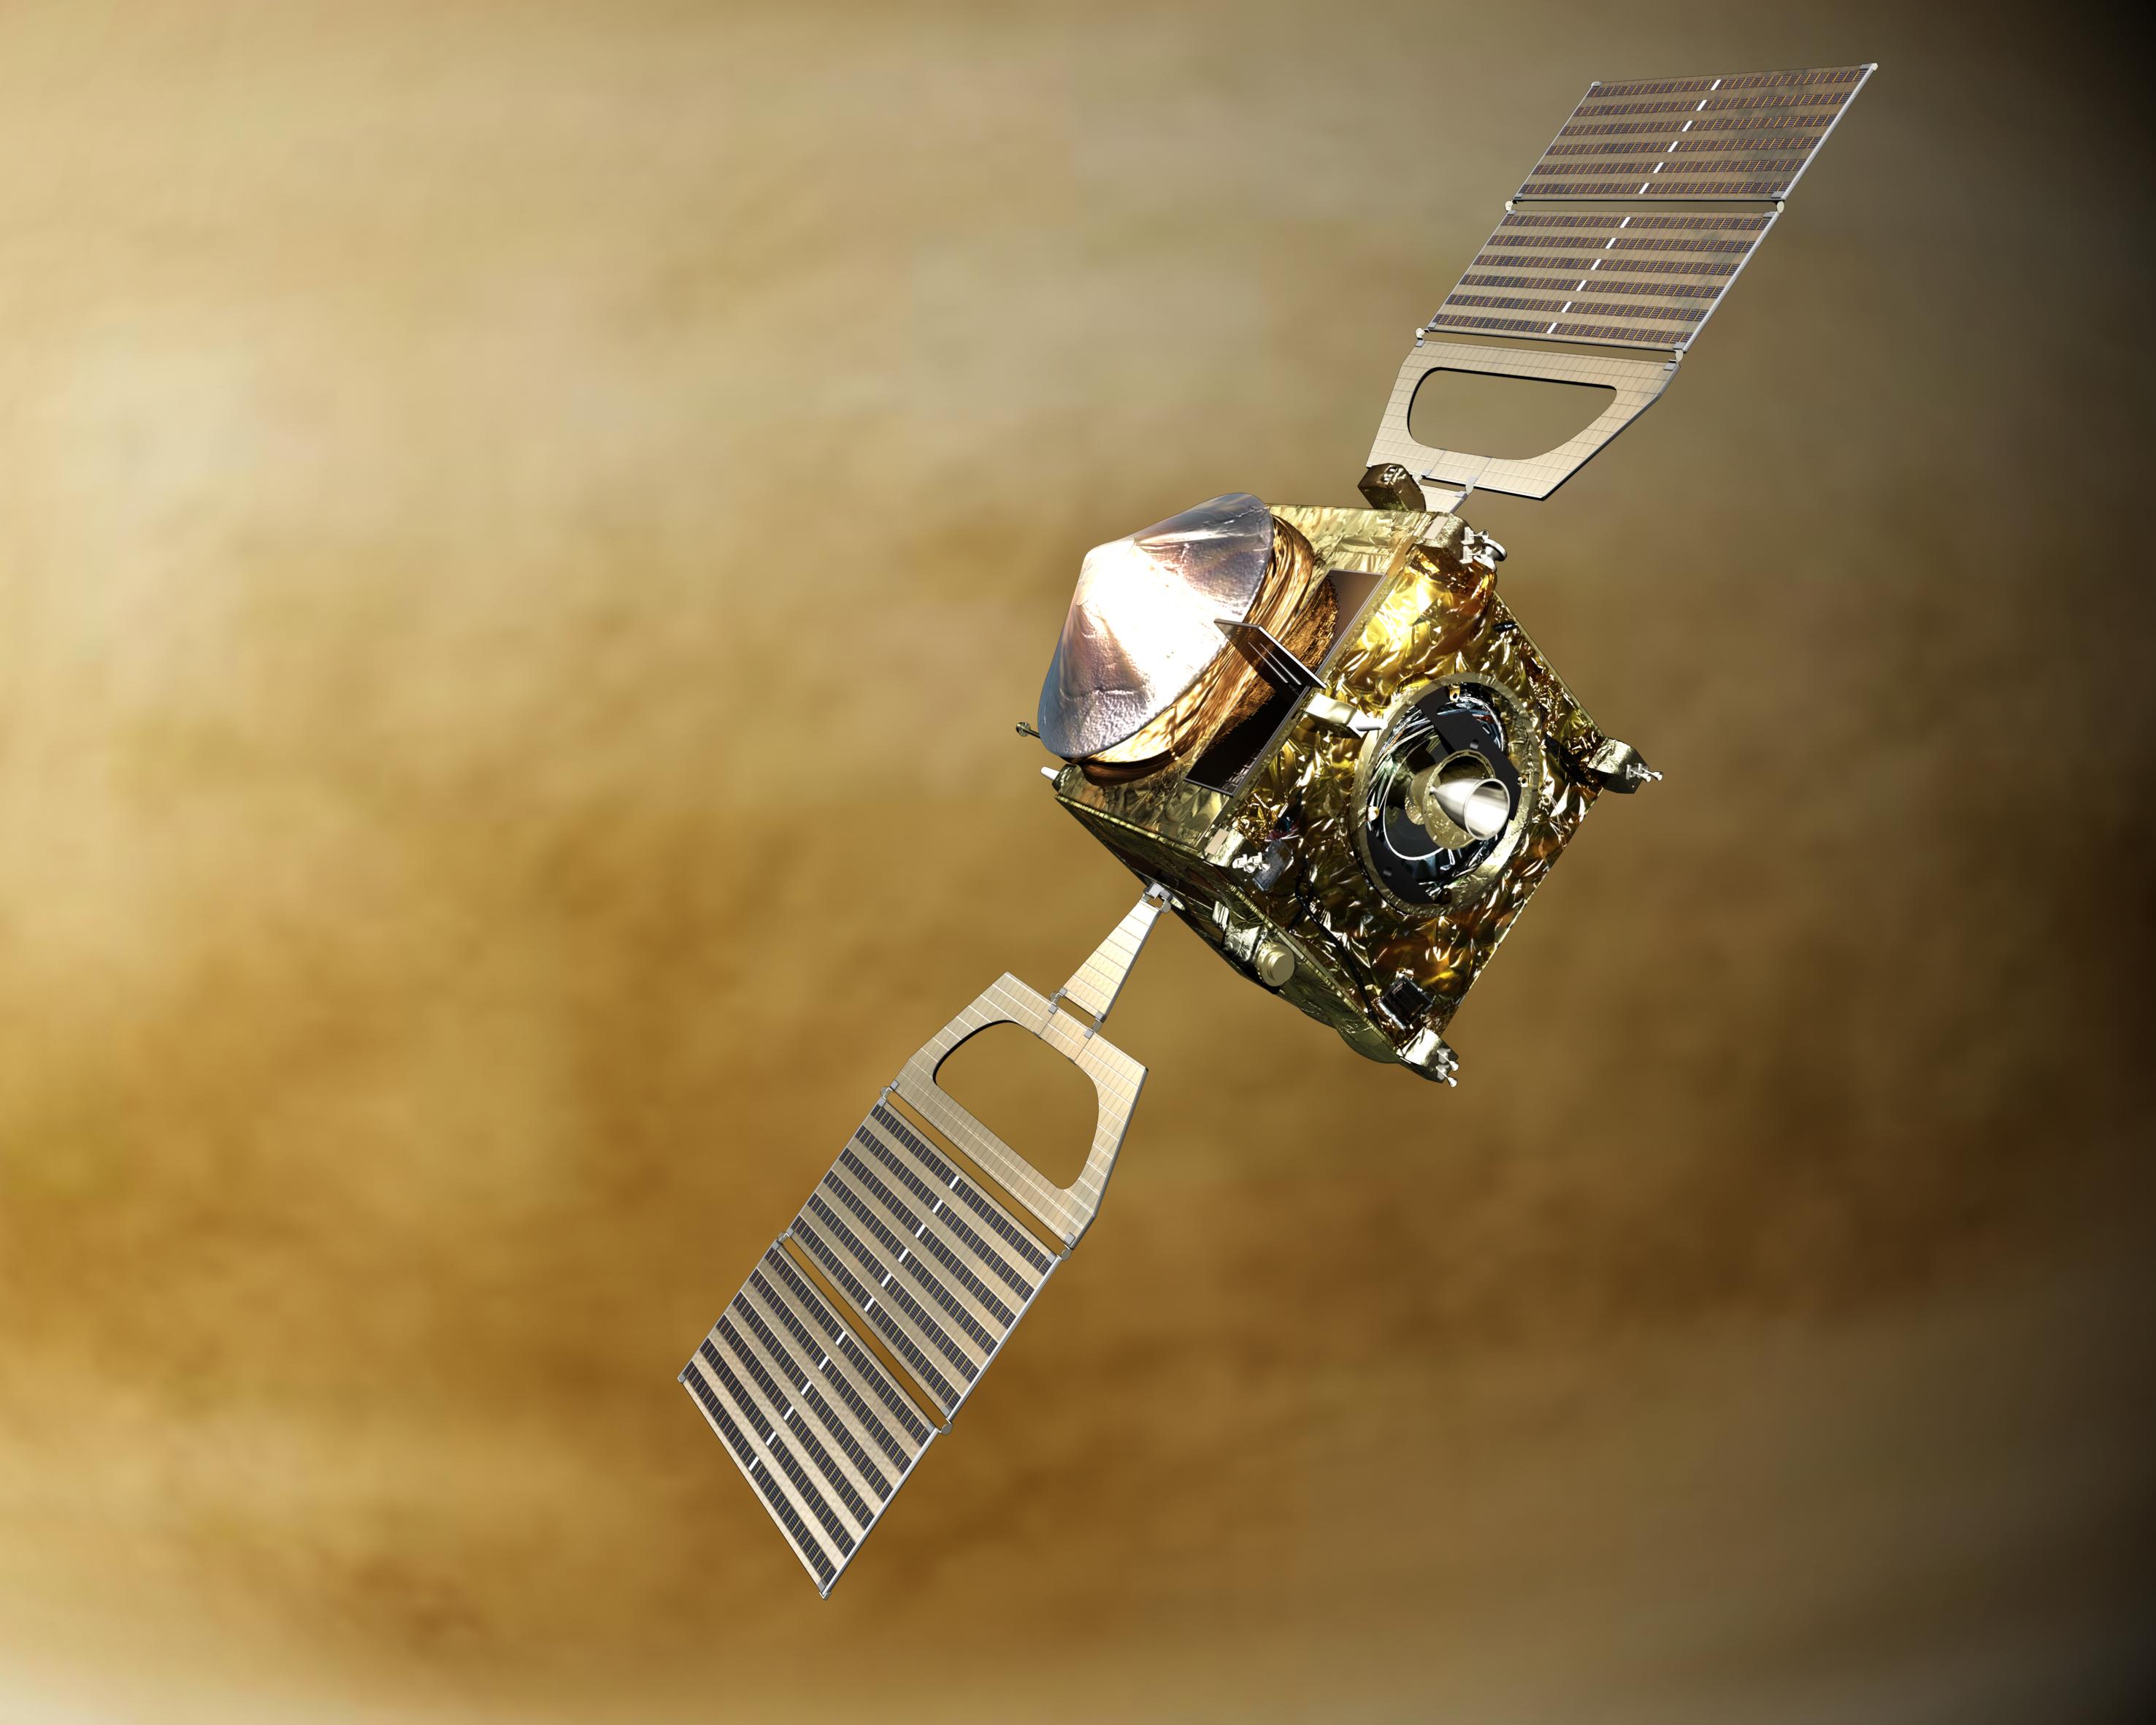 1567219131172-Artist_s_impression_of_Venus_Express_in_orbit.jpg